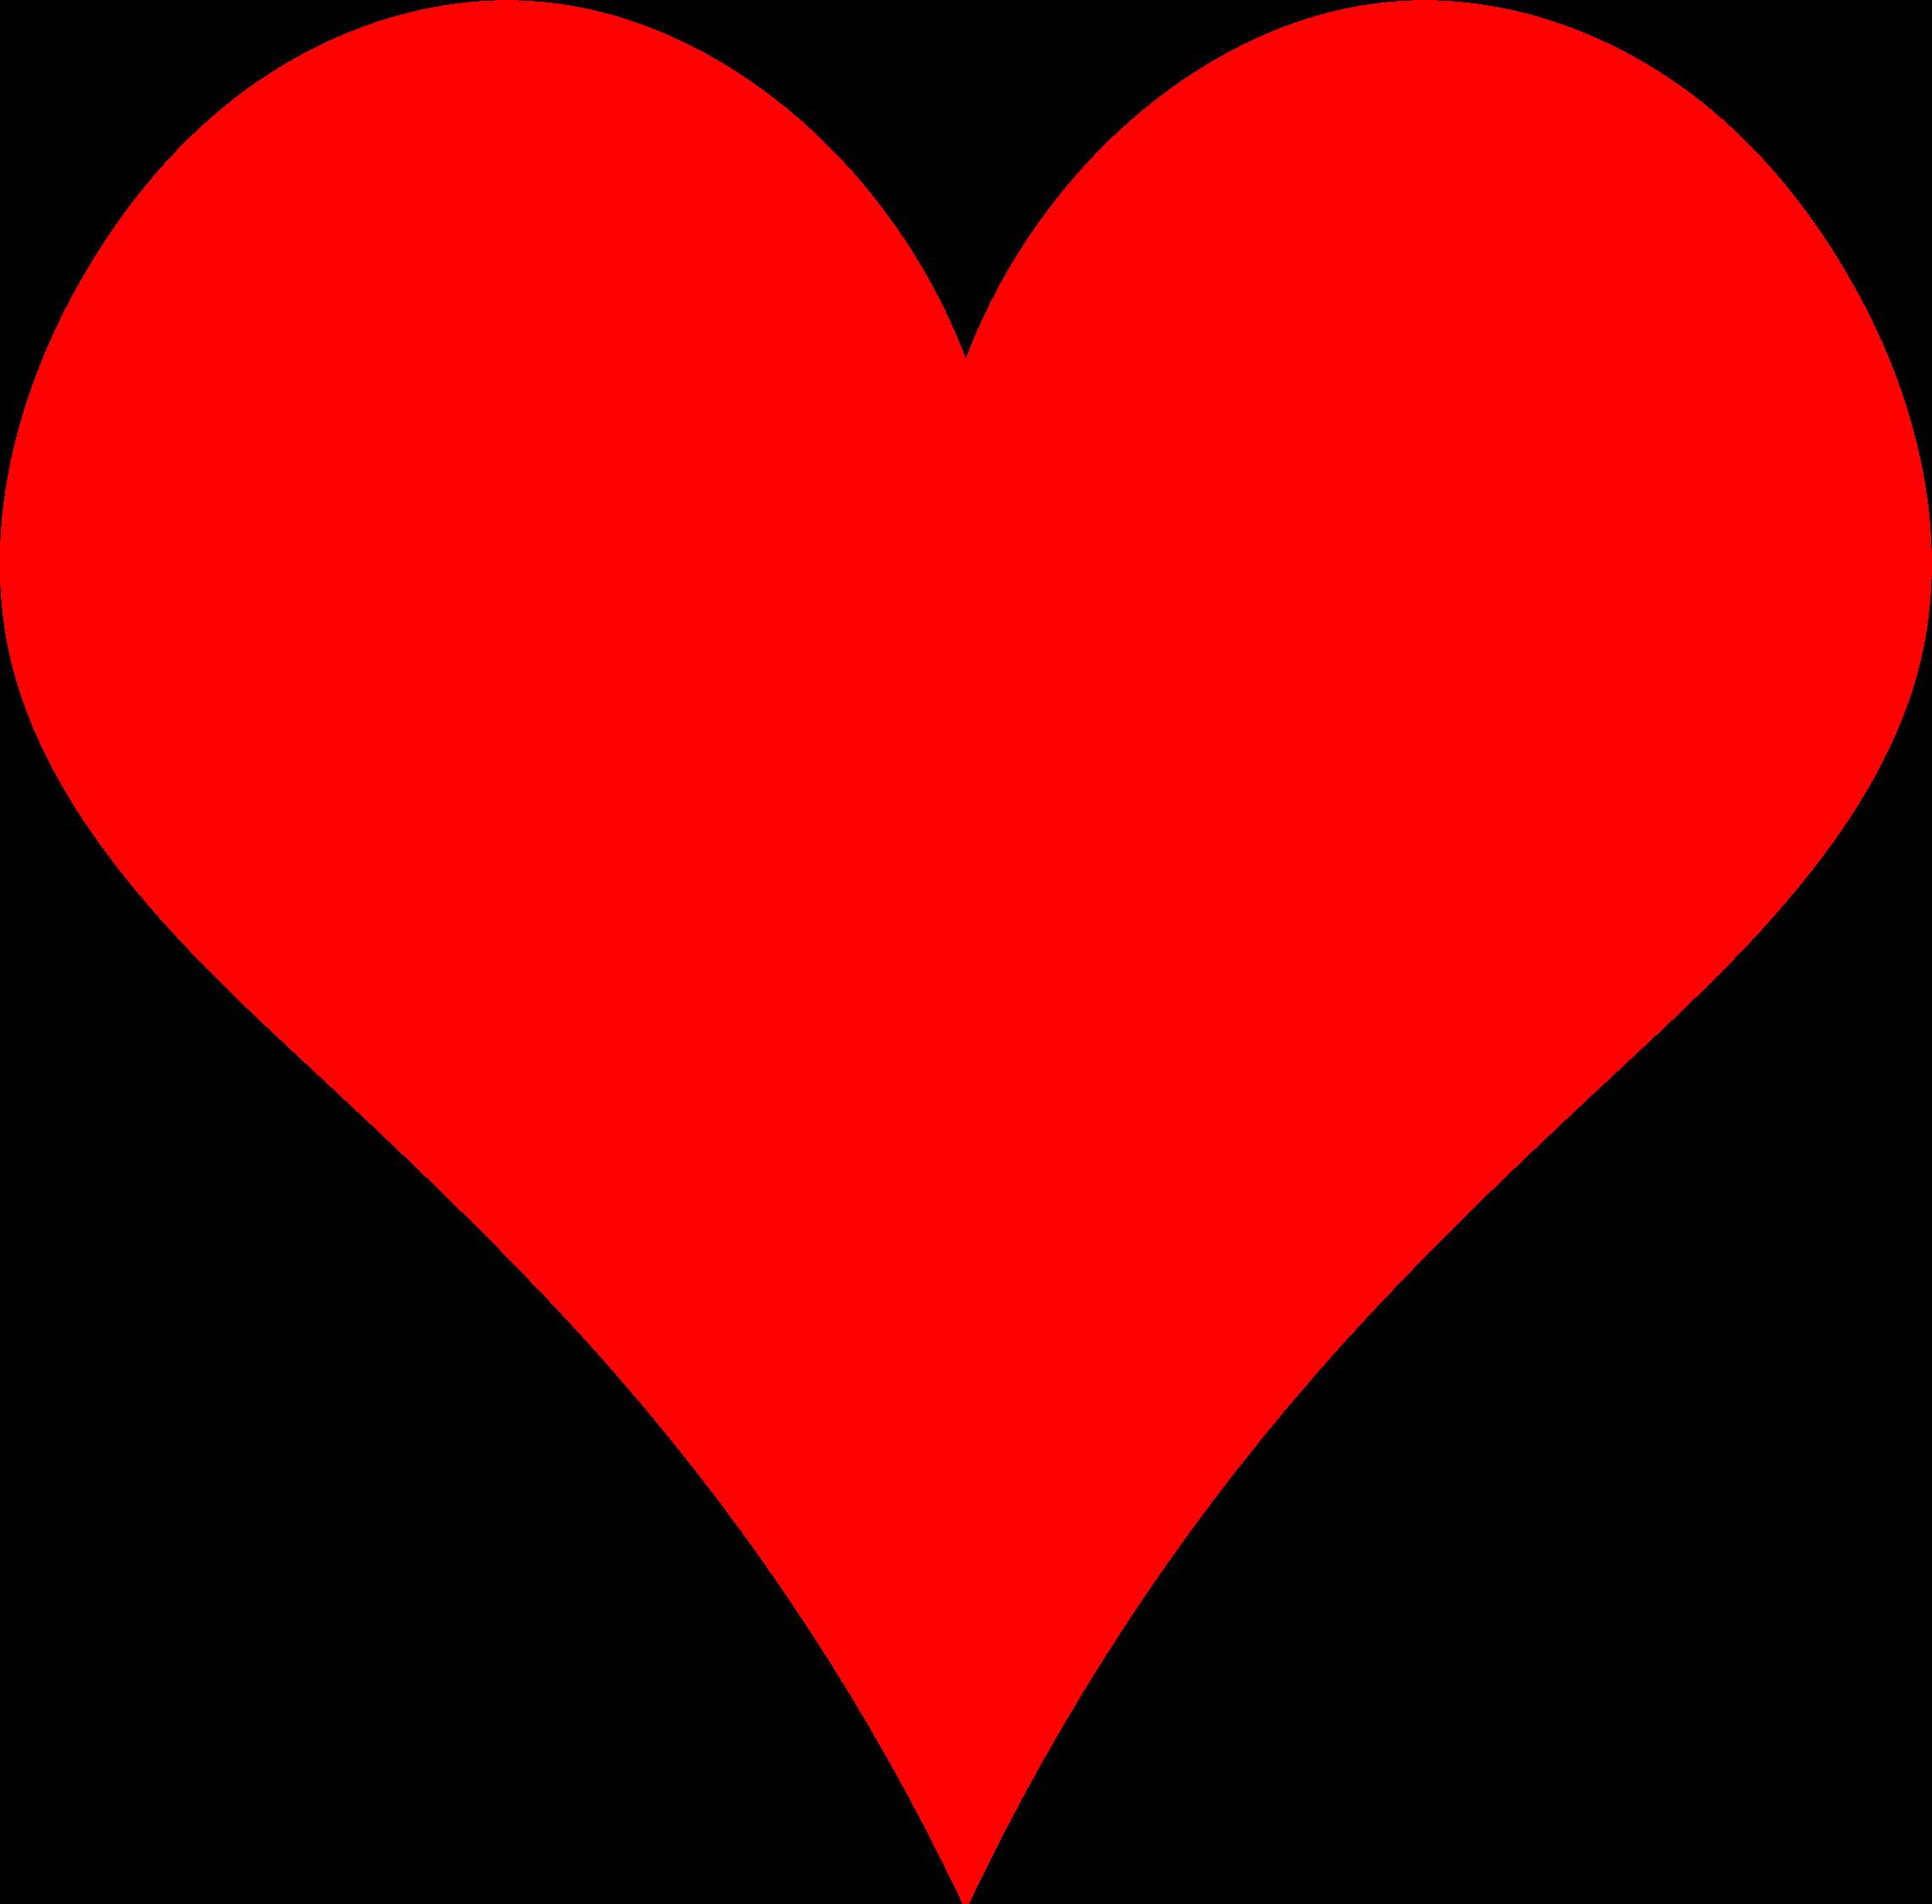 Plain Red Heart - ClipArt Best